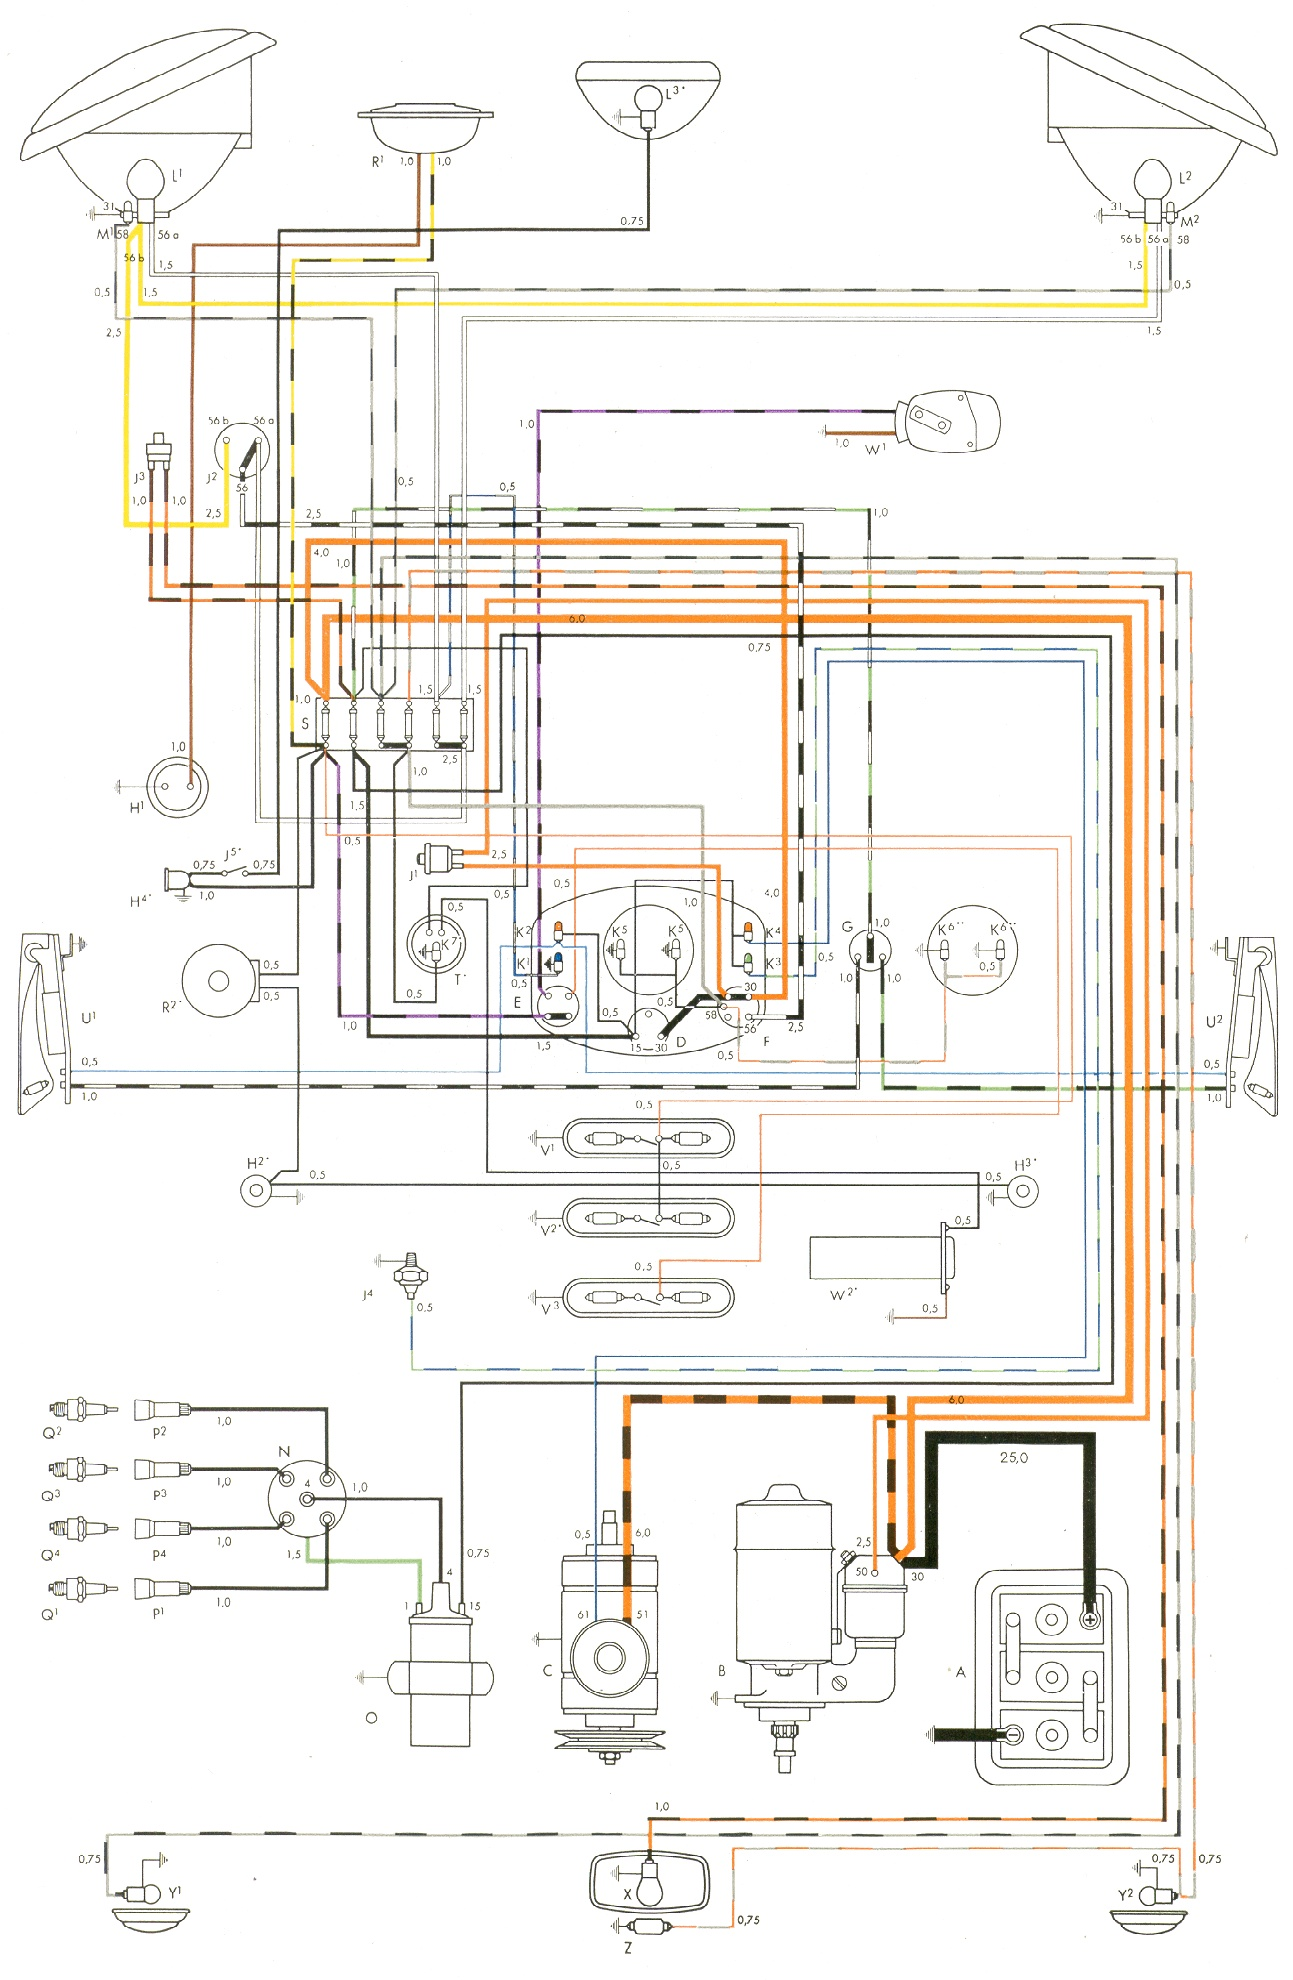 1957 bug wiring diagram rh homesecurity press